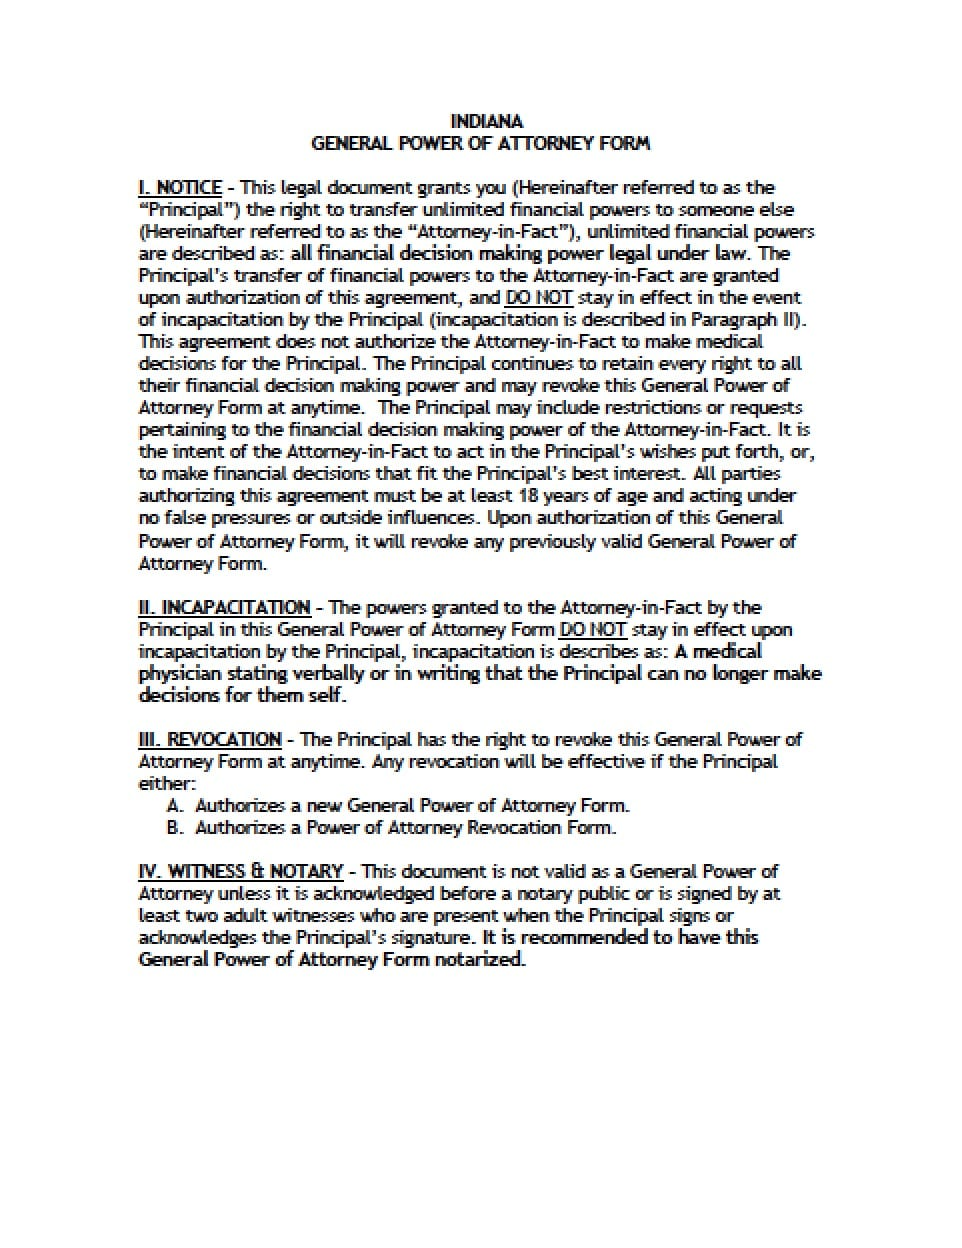 power of attorney form ny 2018 pdf